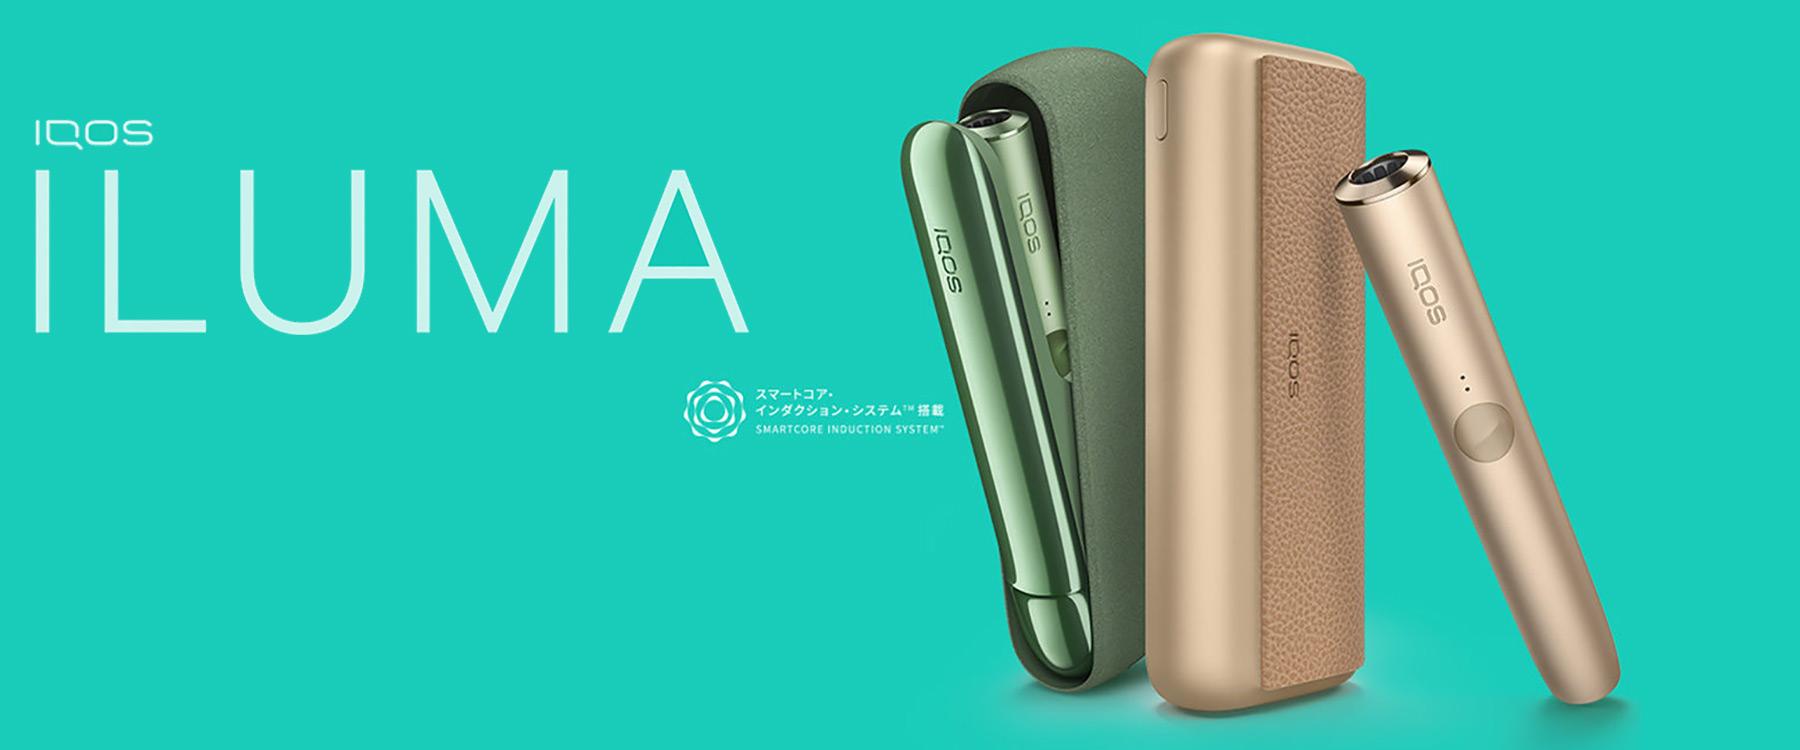 New IQOS ILUMA announced, bladeless, with new heatsticks.